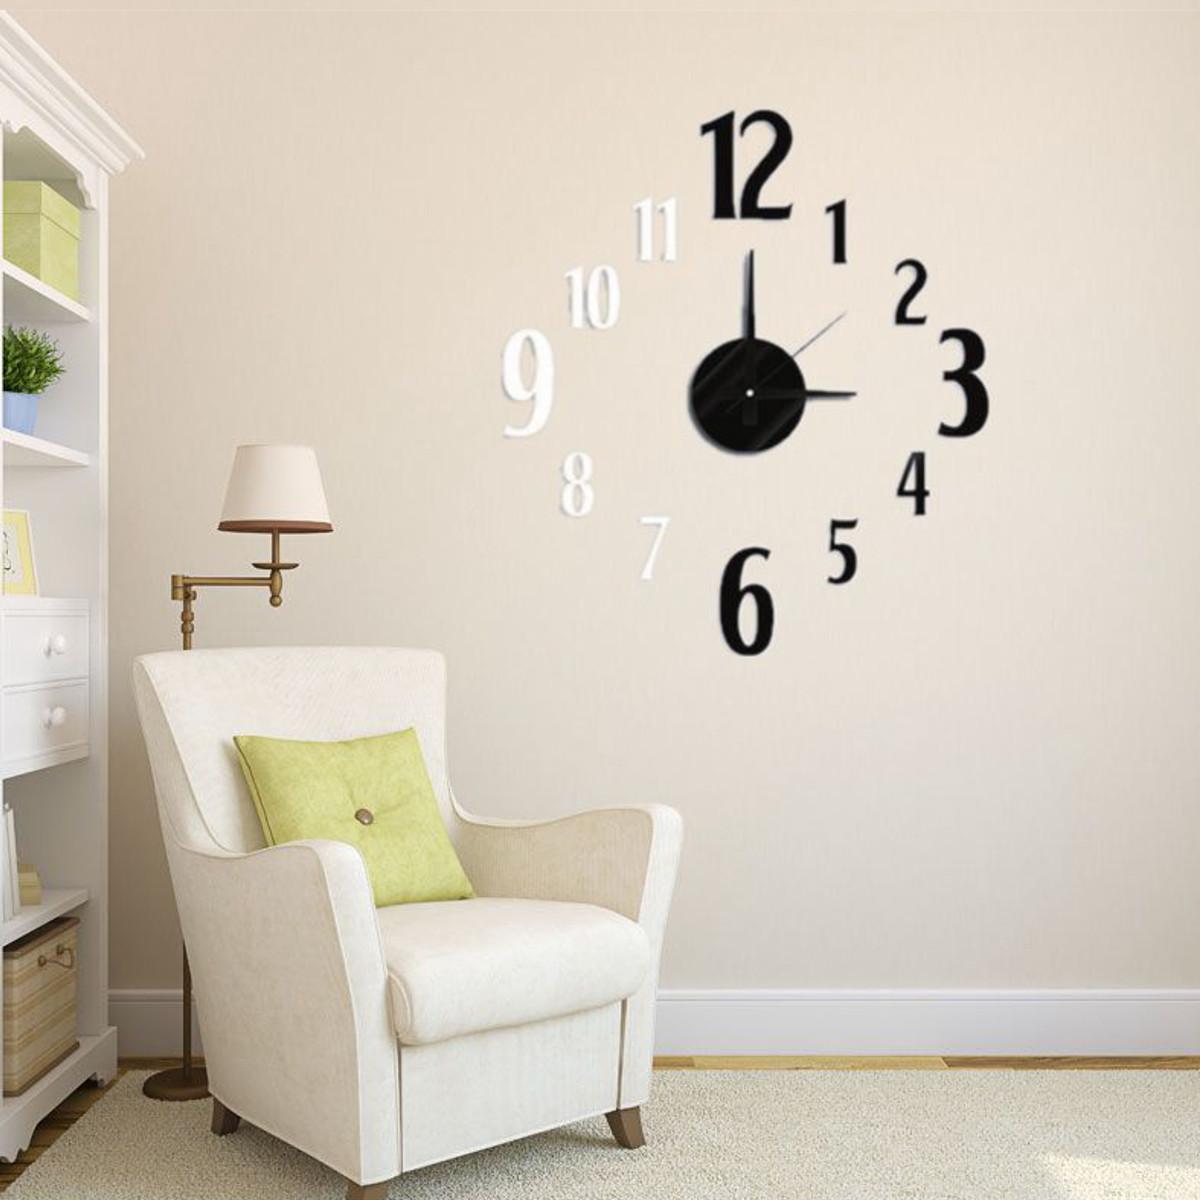 Fee ange sticker mural horloge montre pendule 3d diy adhésive ...